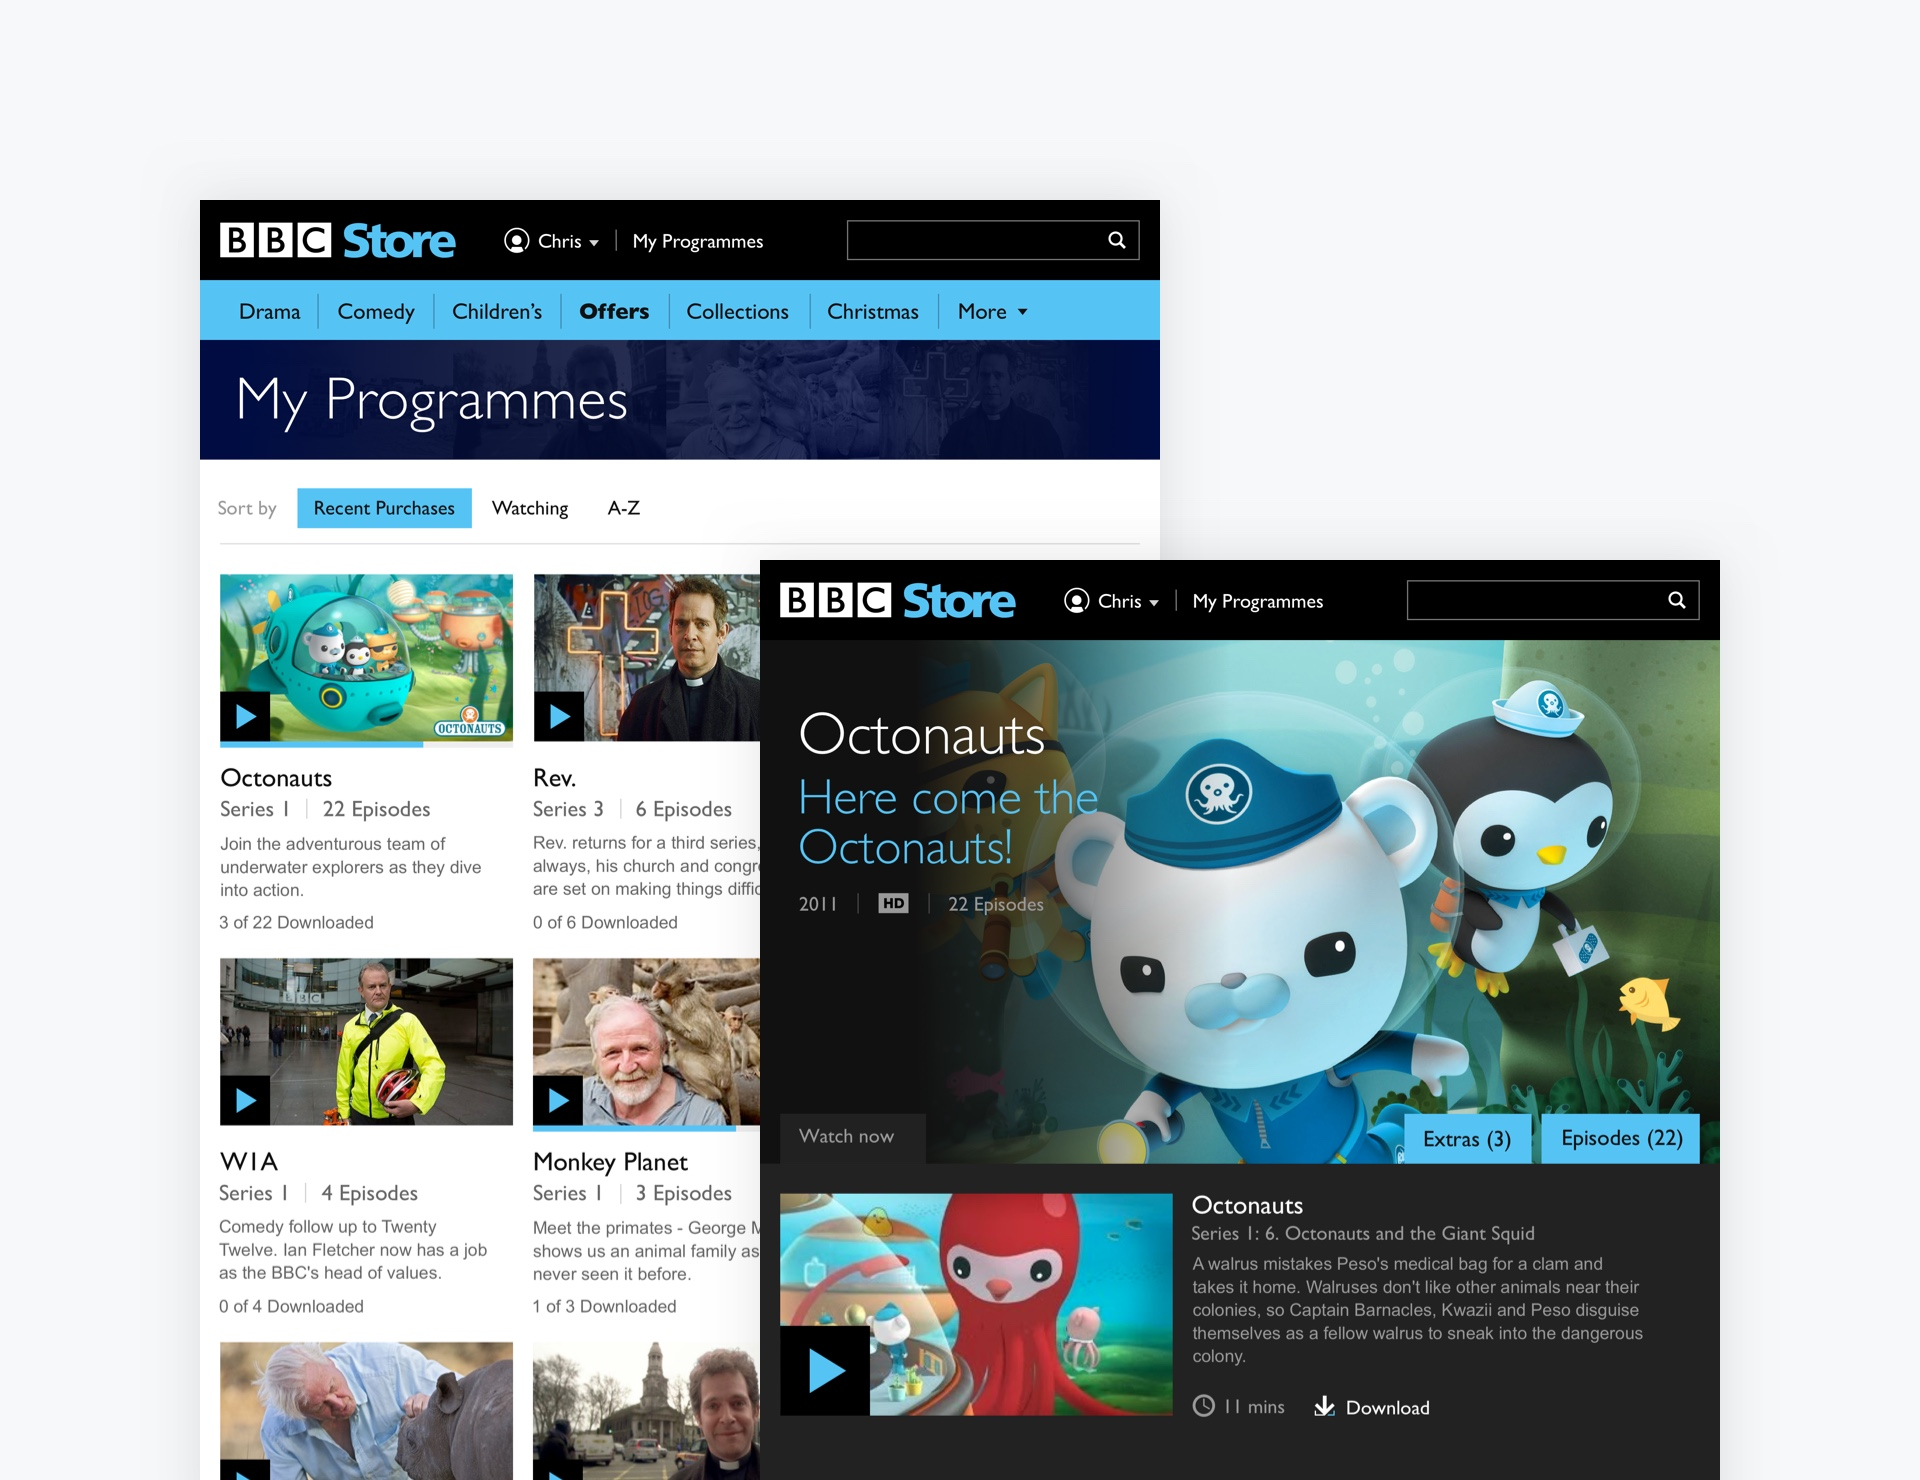 BBC Store - Sense of ownership